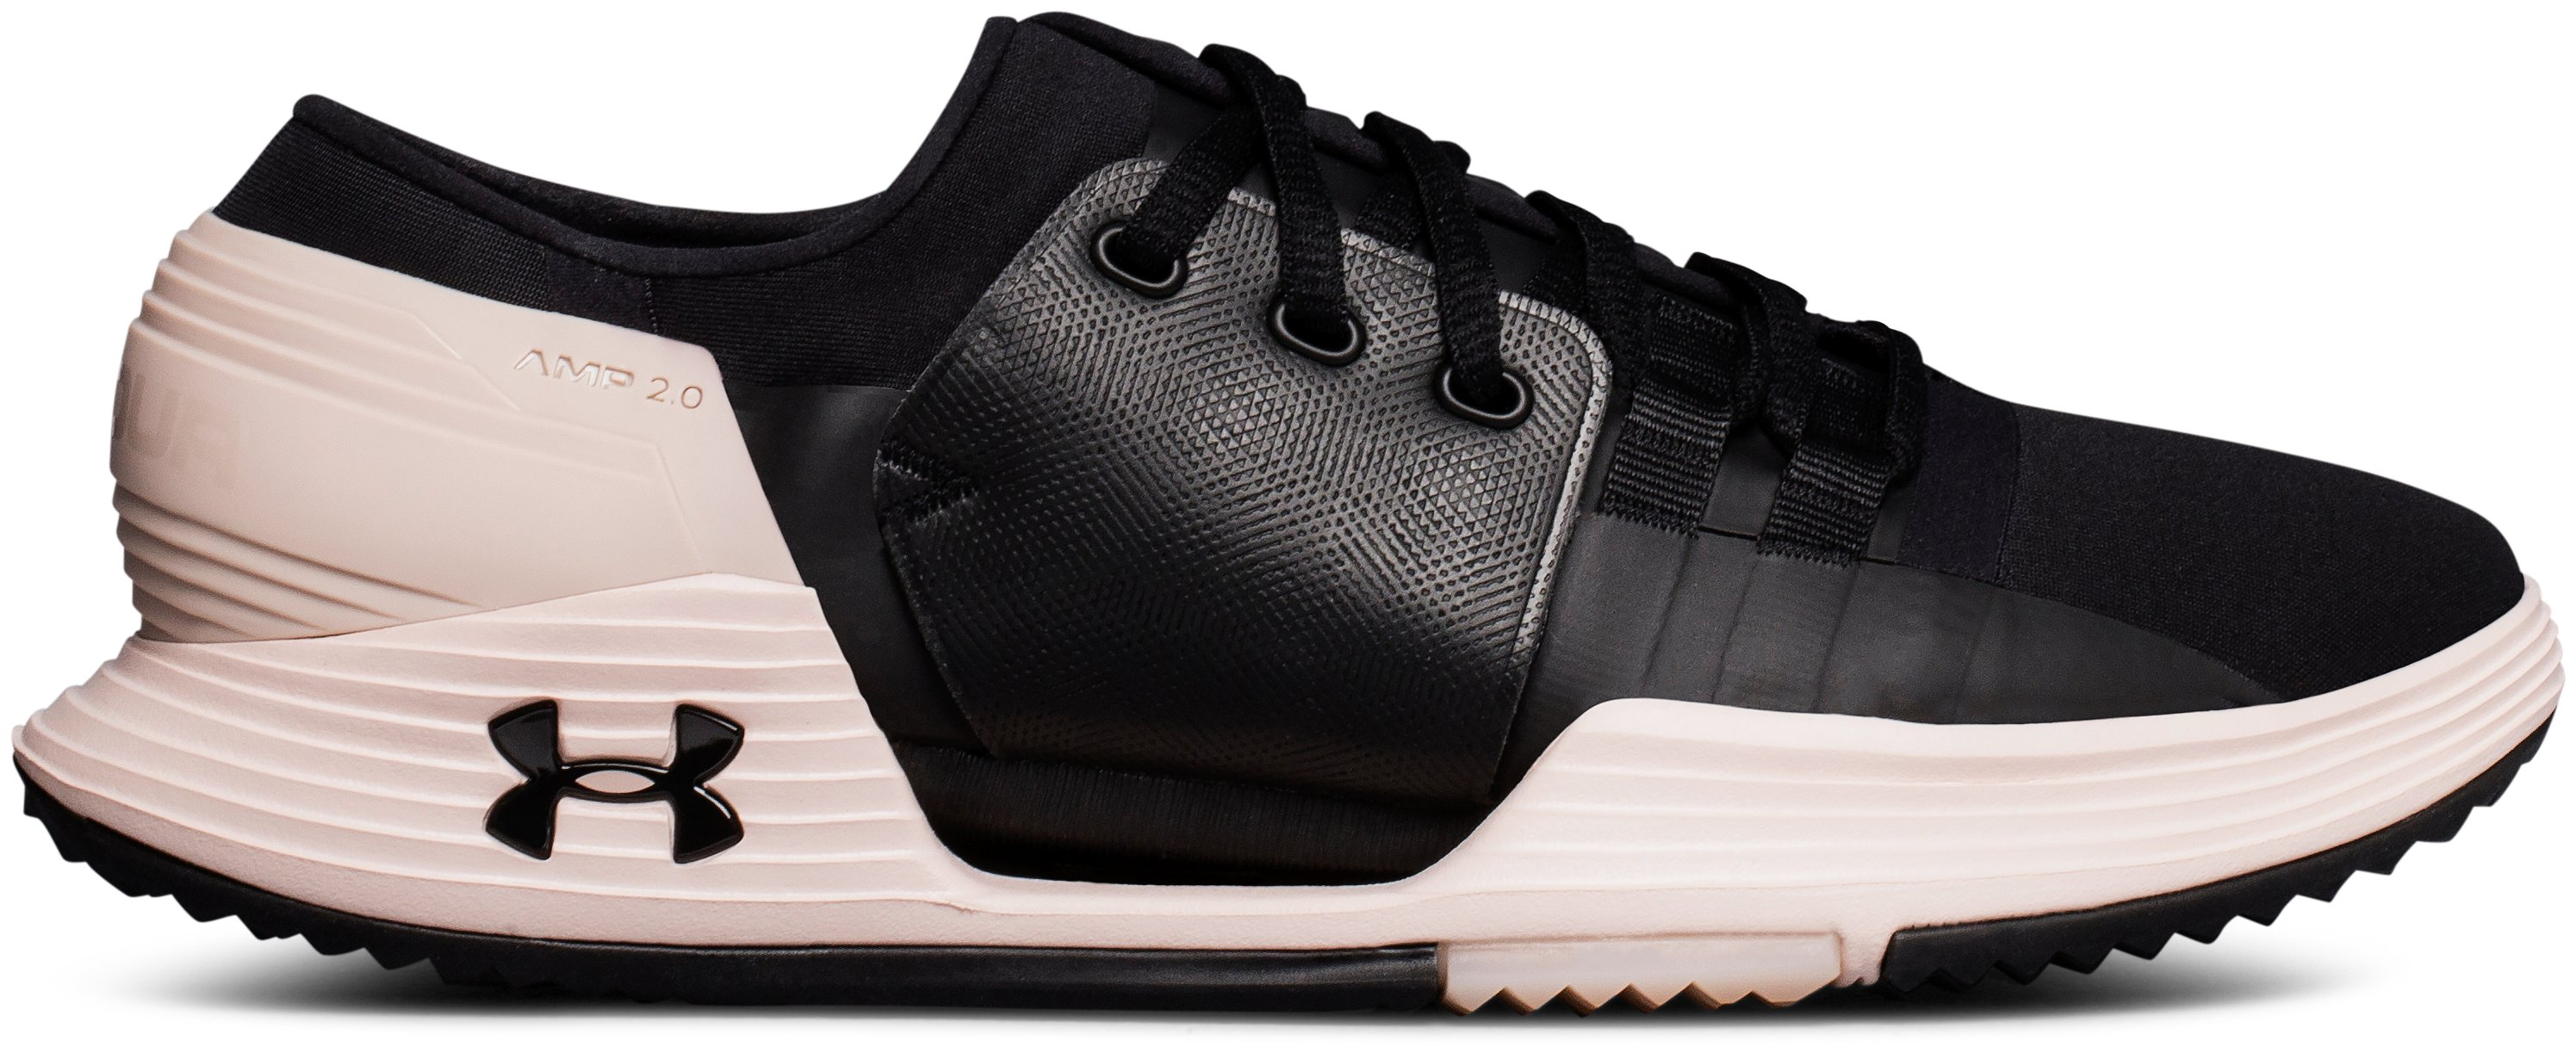 Sepatu Olahraga UA SpeedForm® AMP 2.0 untuk Wanita, 360 degree view